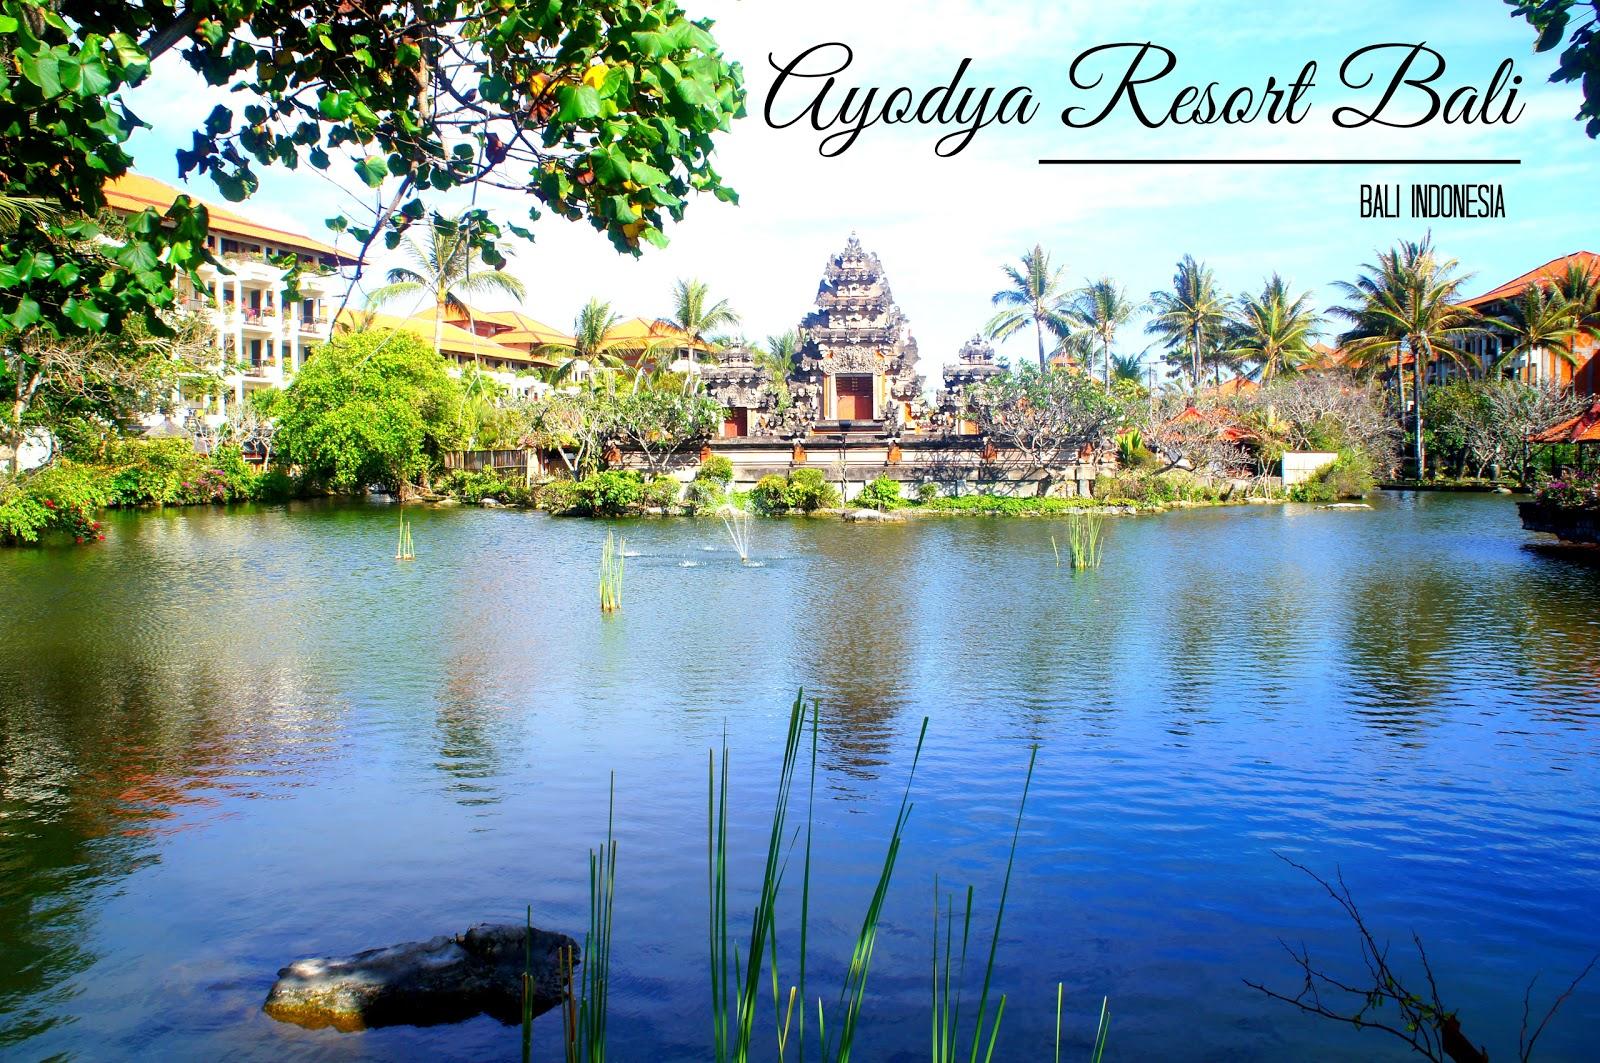 A glad diary ayodya resort bali indonesia for Indonesia resorts bali